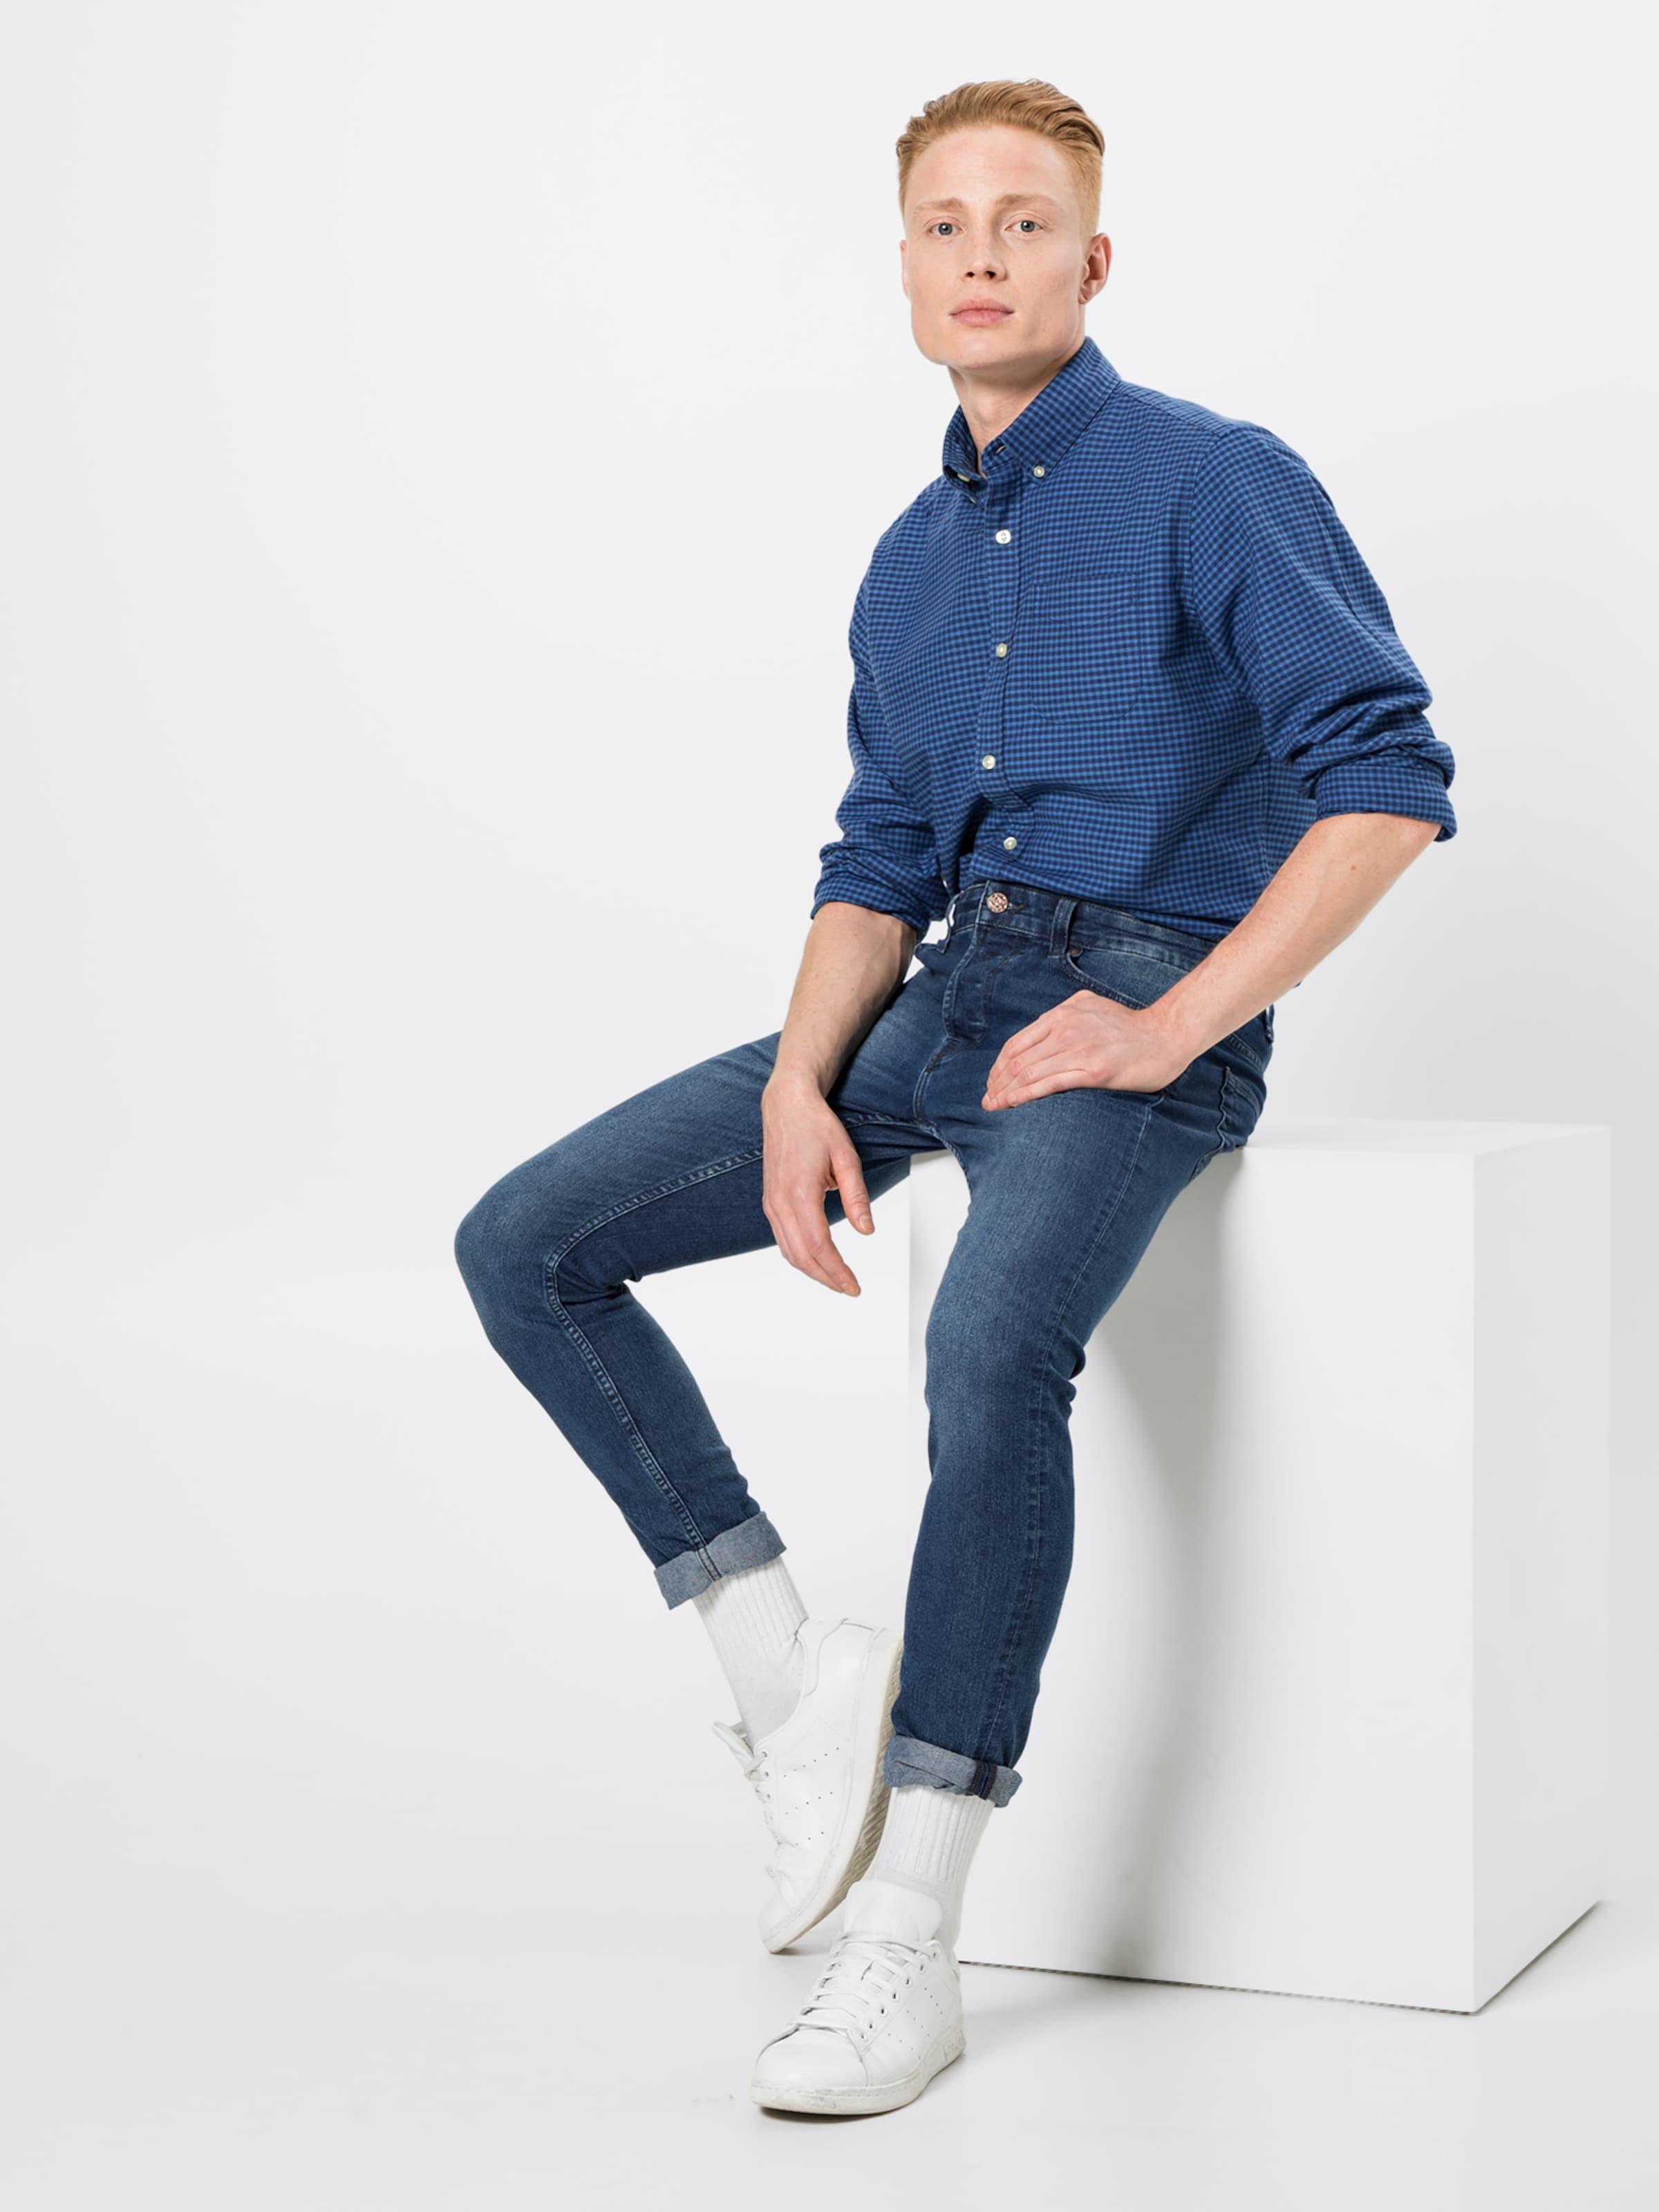 2018 Shirts' En 'holiday Chemise Gap Marron Oxford Yyb7gfI6mv